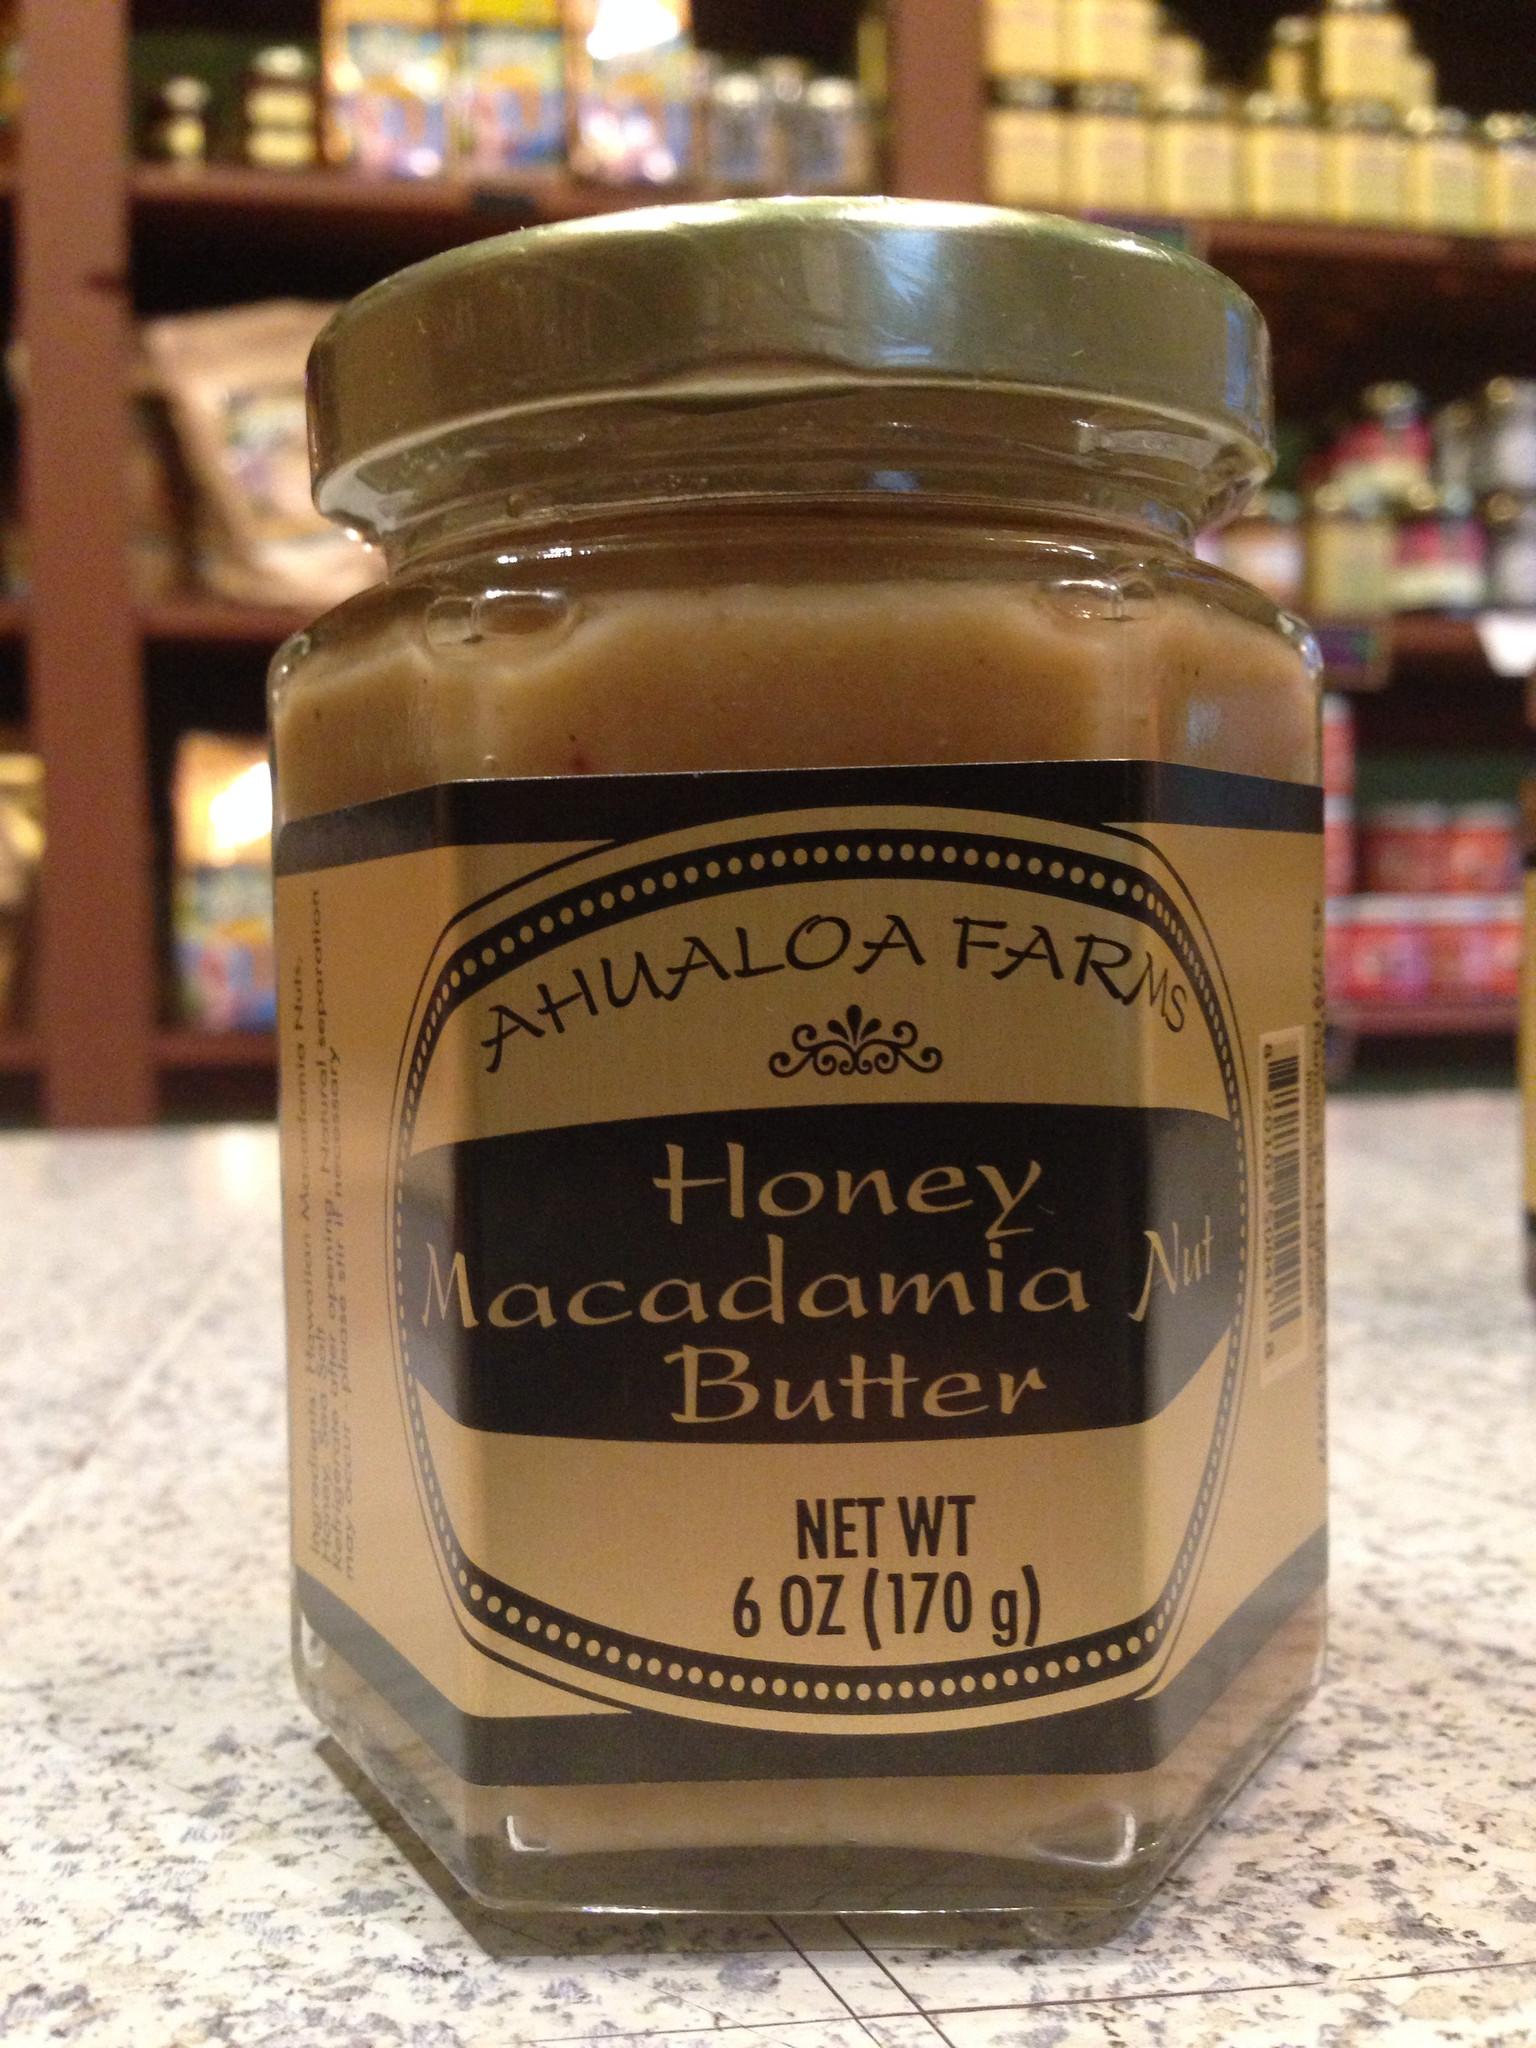 Honey Macadamia Nut Butter